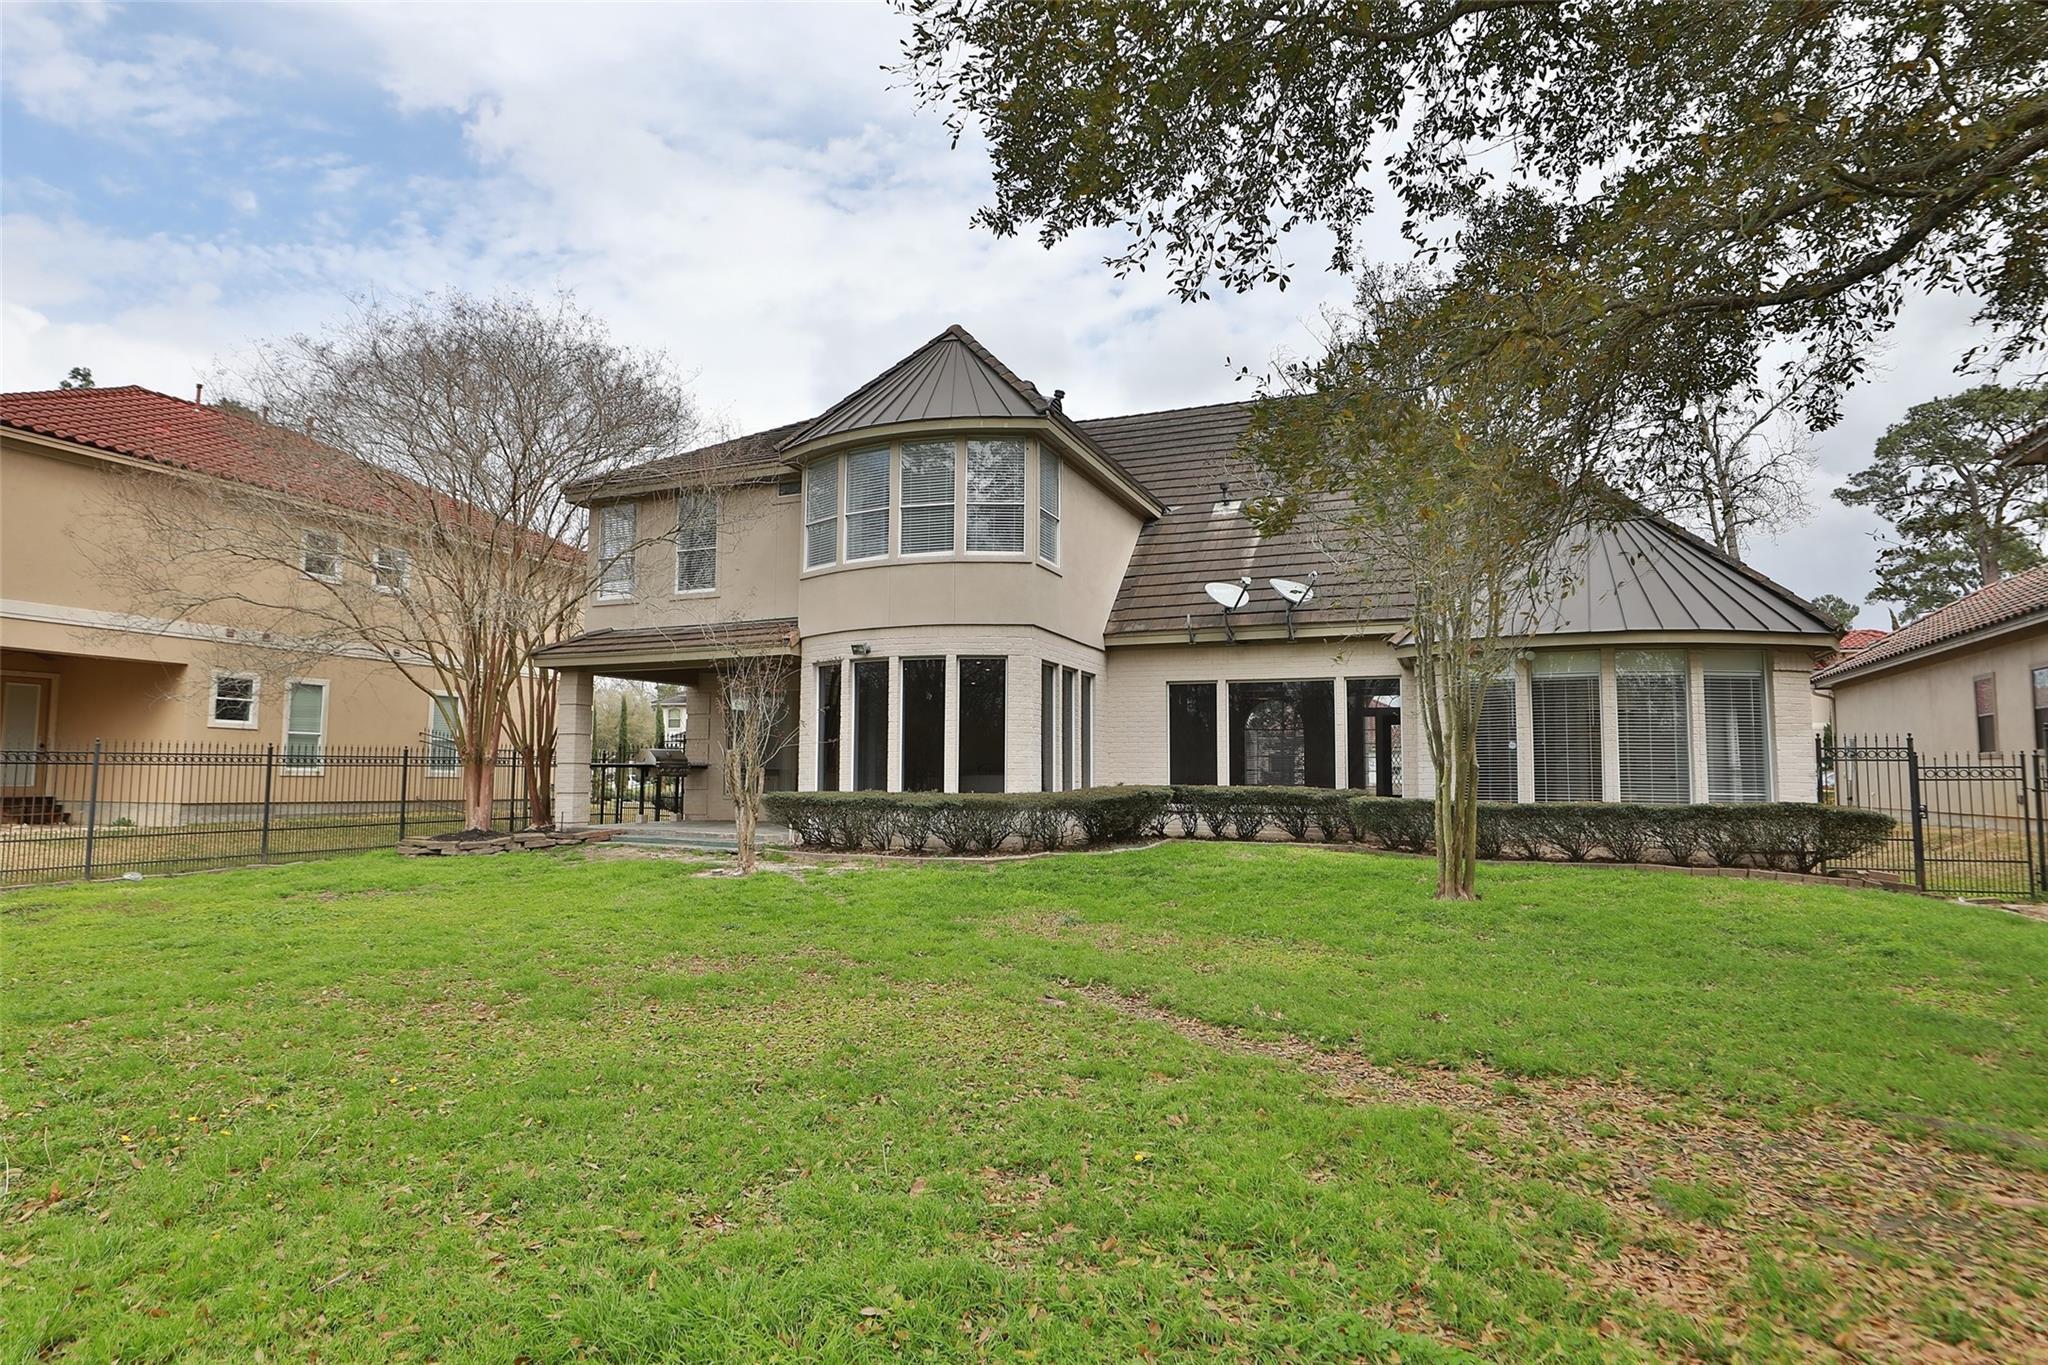 16019 Fawn Vista Property Photo